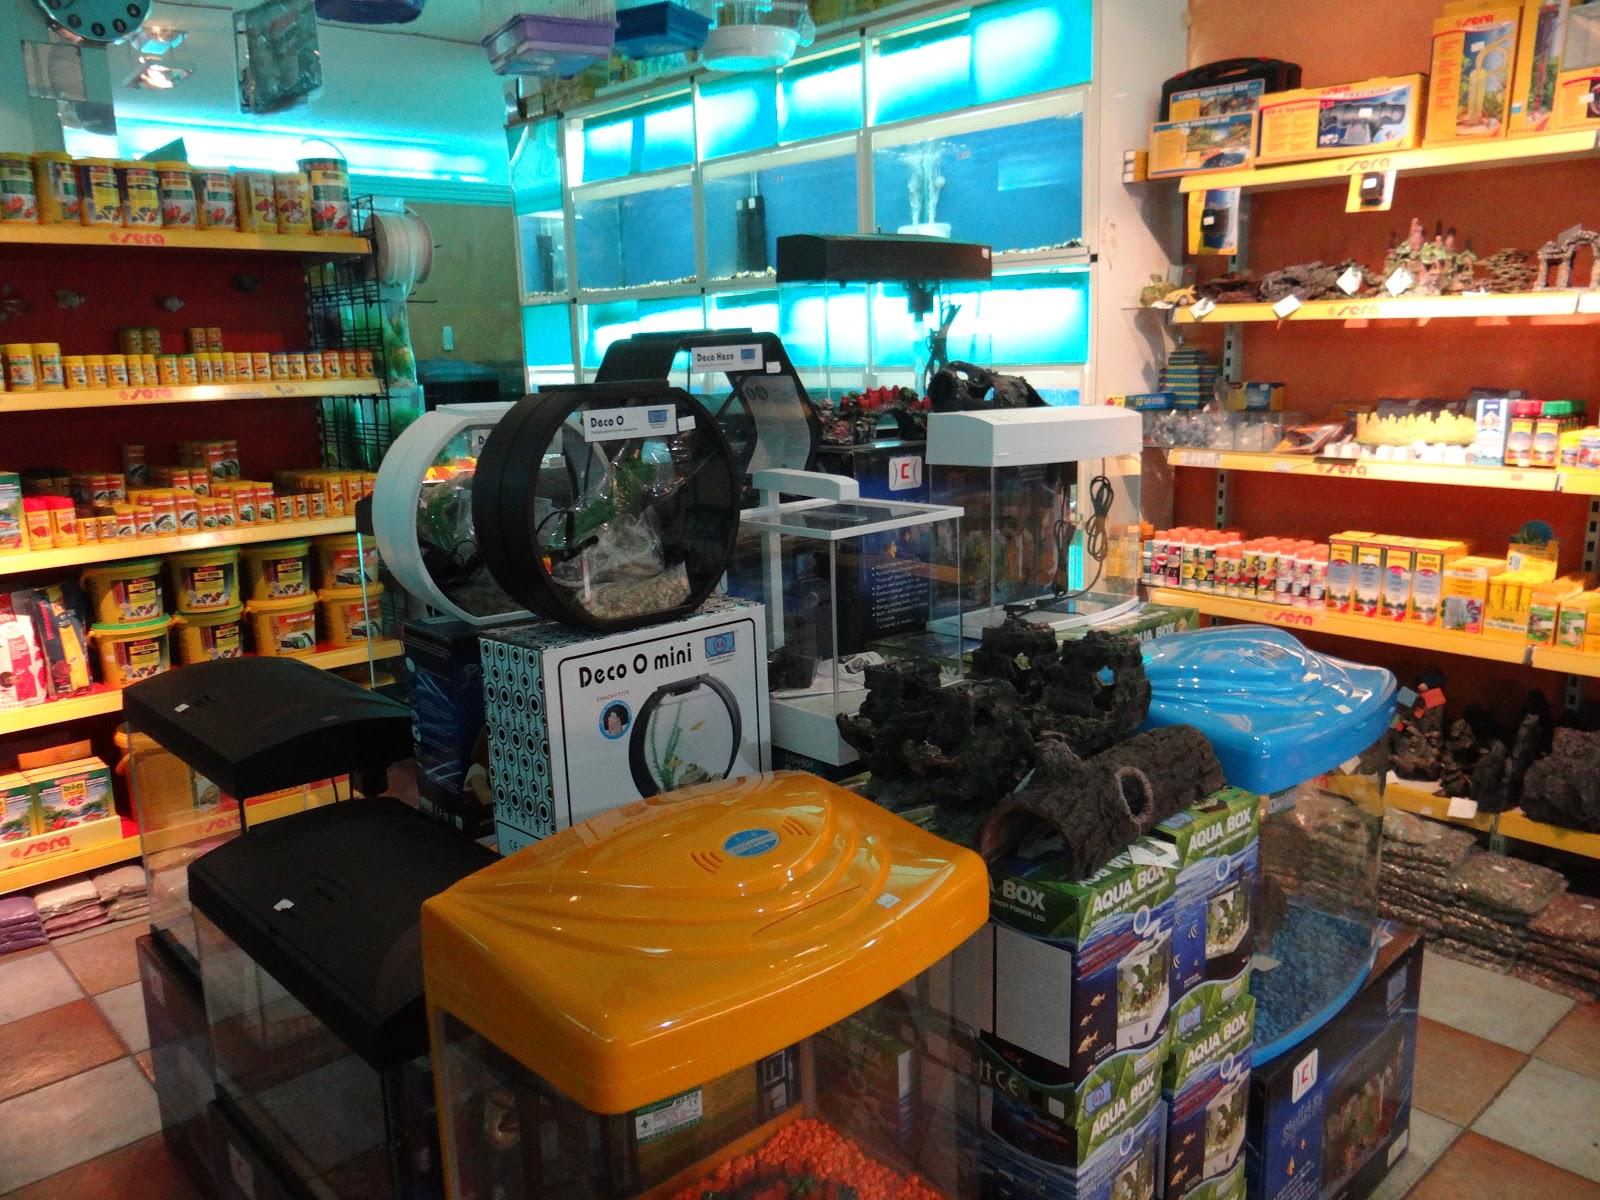 Fish aquarium sale in qatar - Selection Of Some Tanks Food And Fish